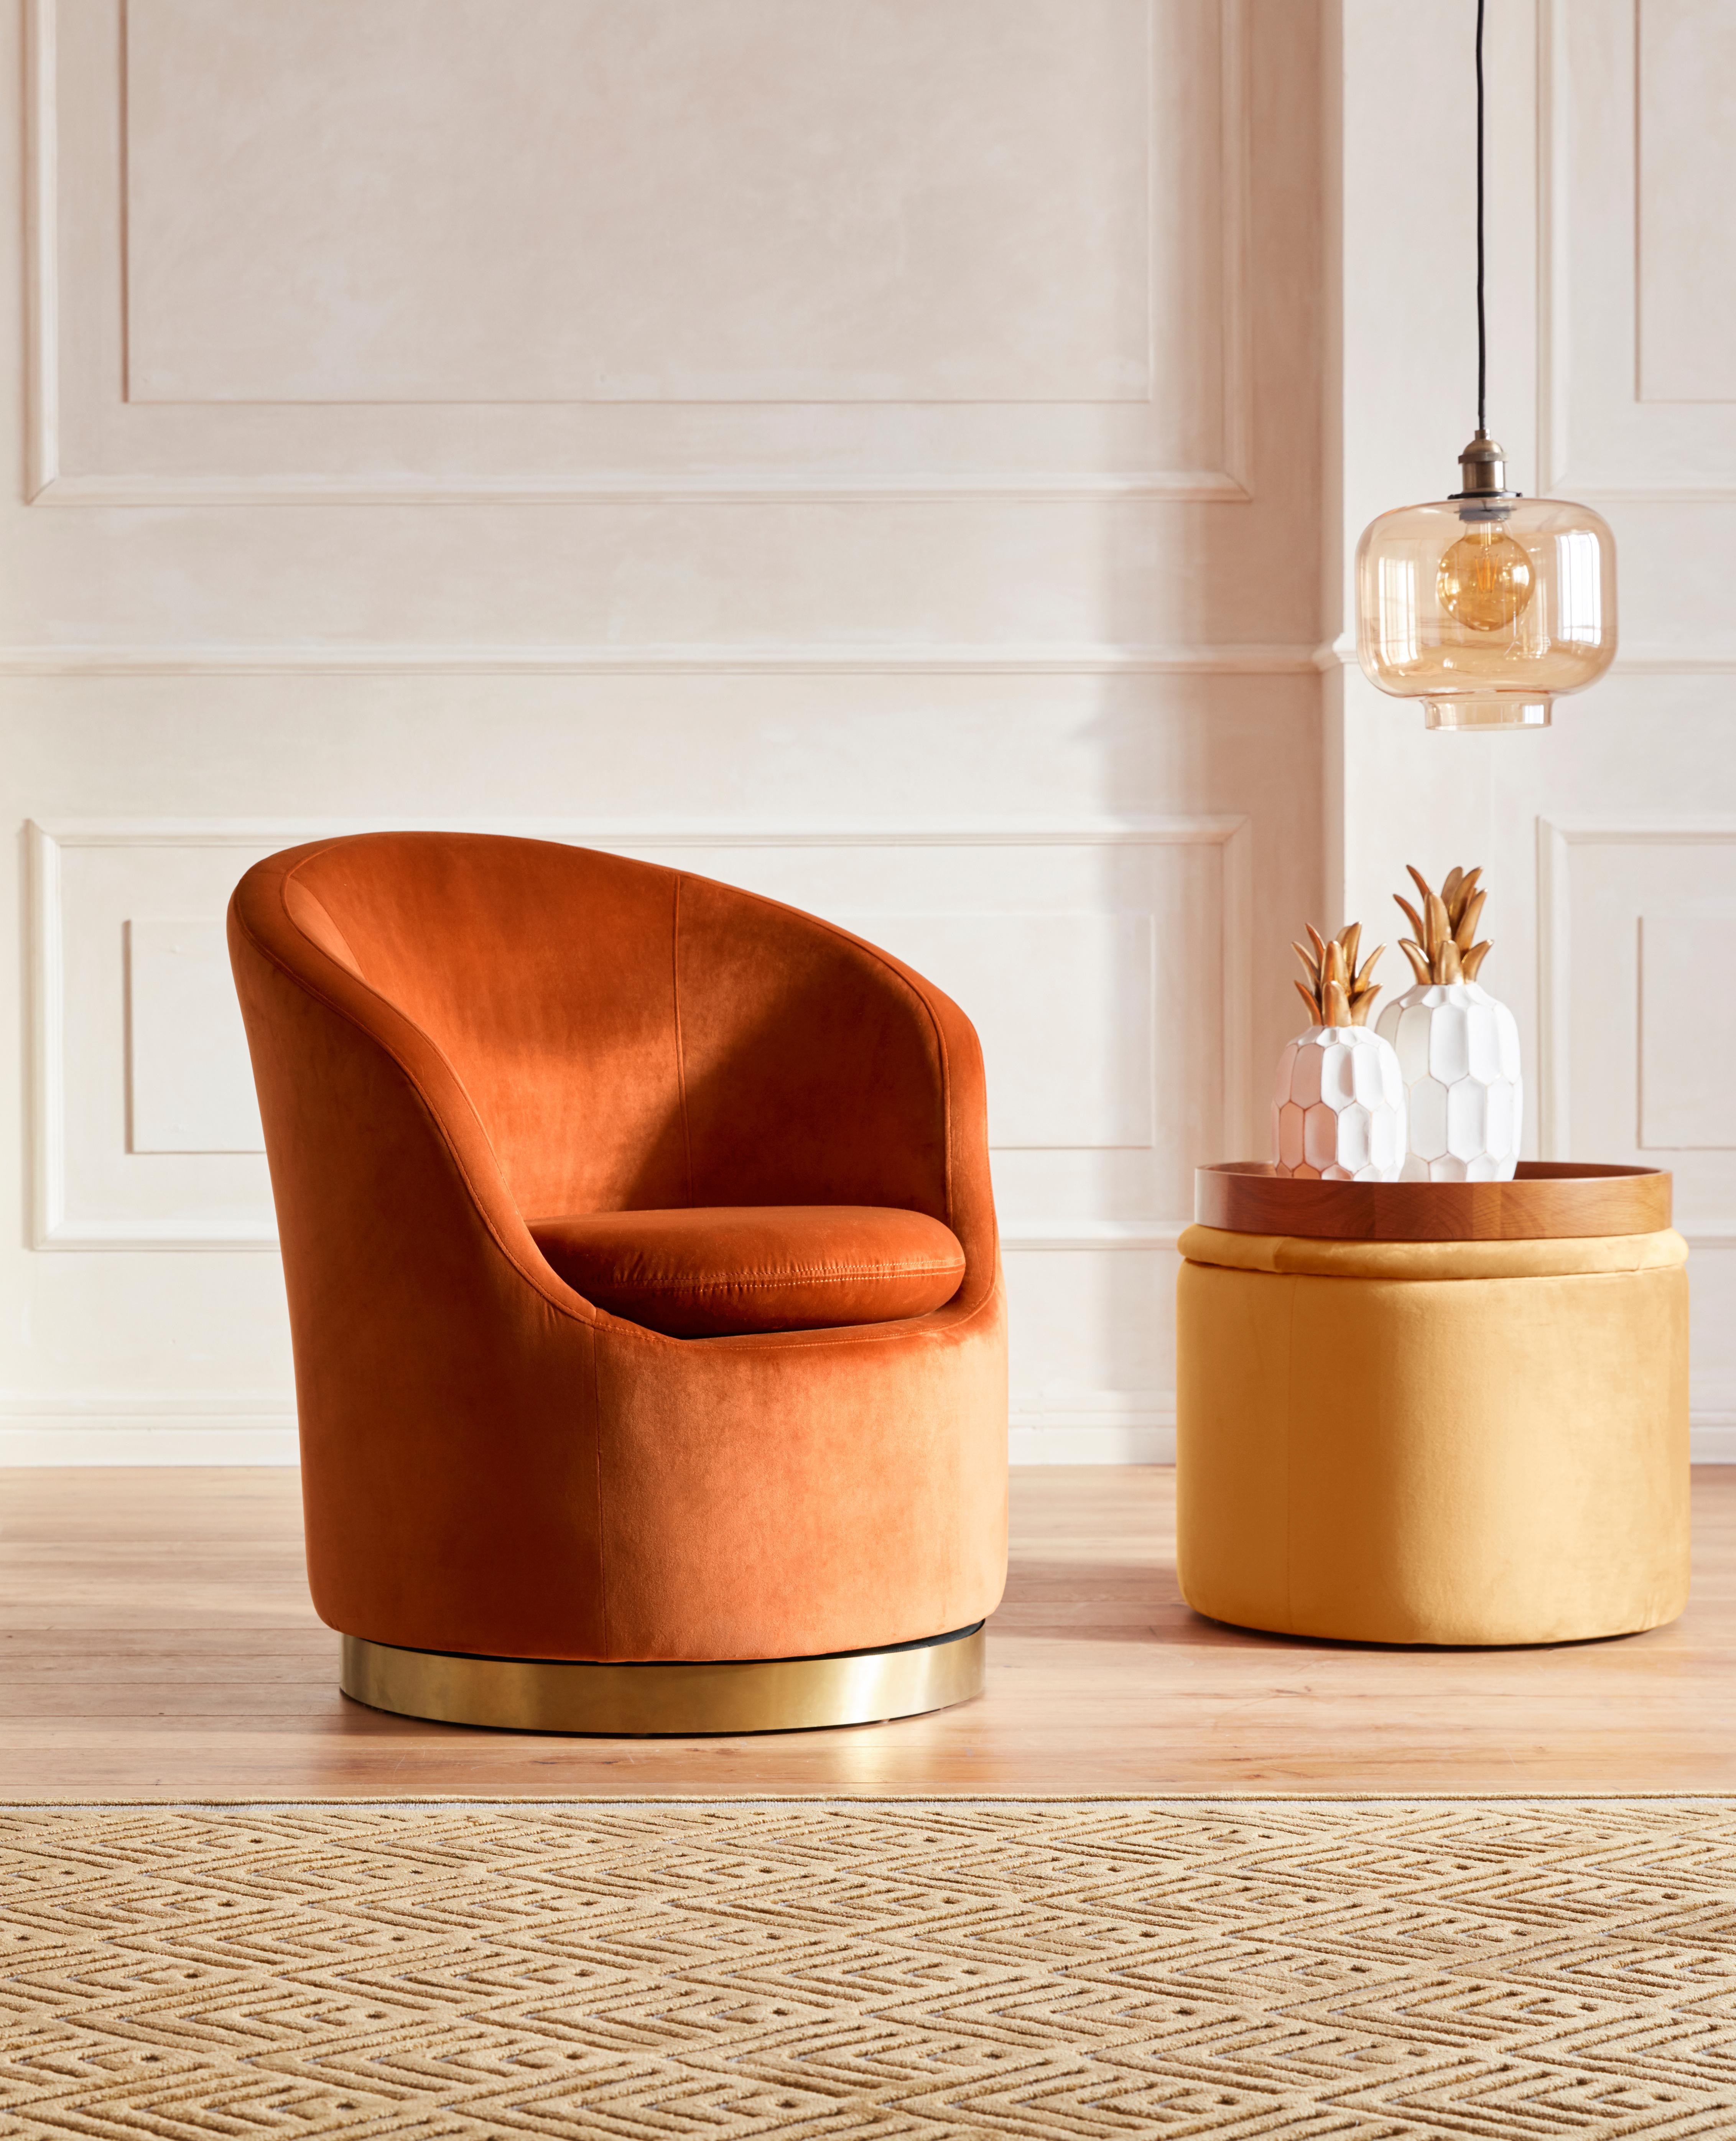 GMK Home & Living Sessel SUBOTICA mit Drehfunktion